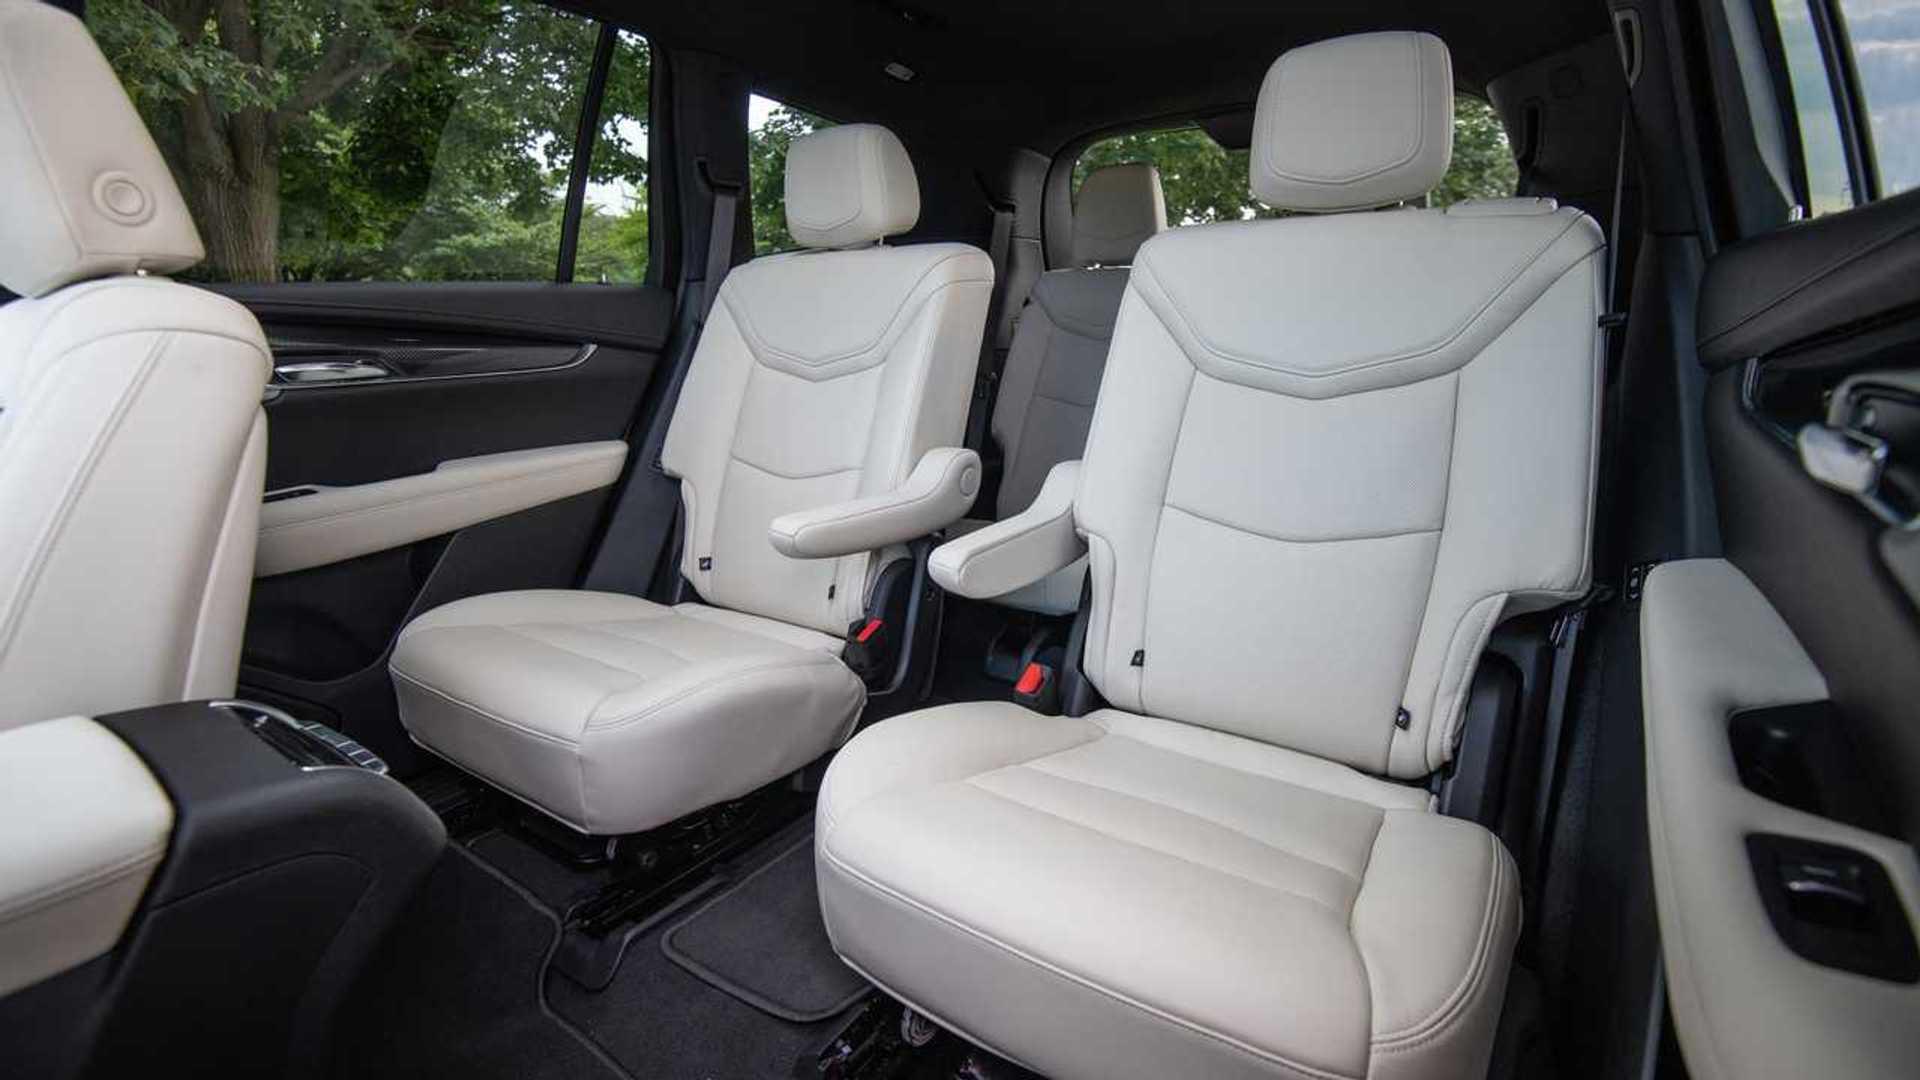 2020 Cadillac XT6 First Drive: Mo' Money, Mo' Problems